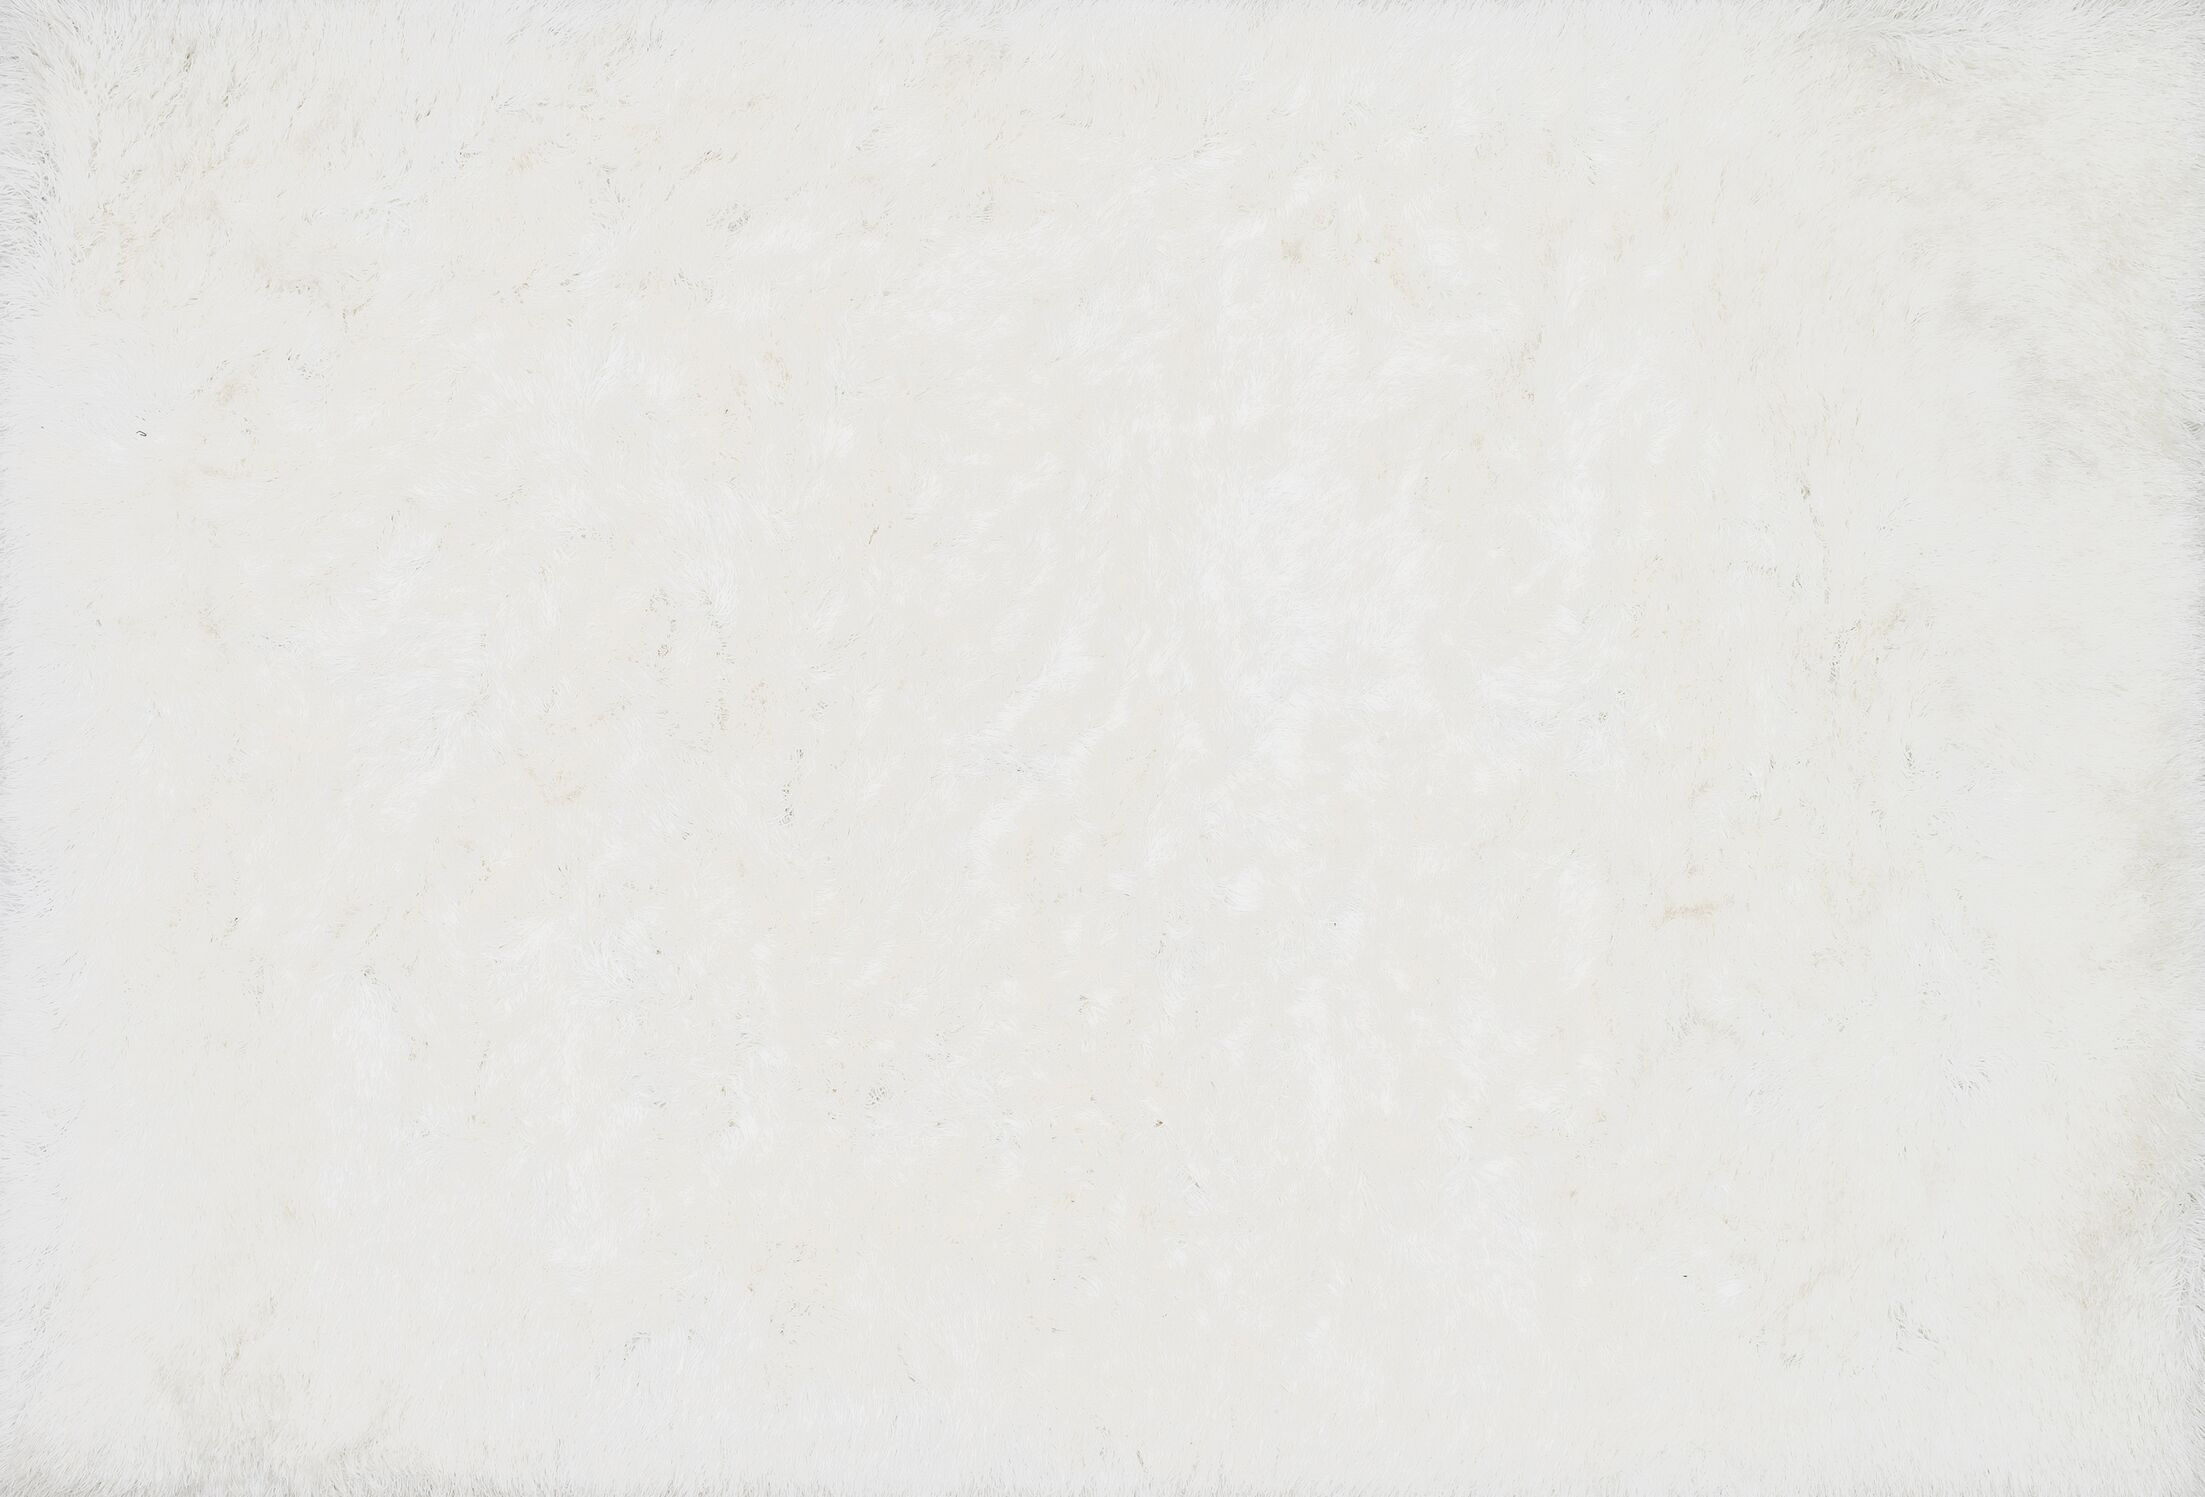 Siipola Shag Hand-Tufted Area Rug Rug Size: Rectangle 3'6